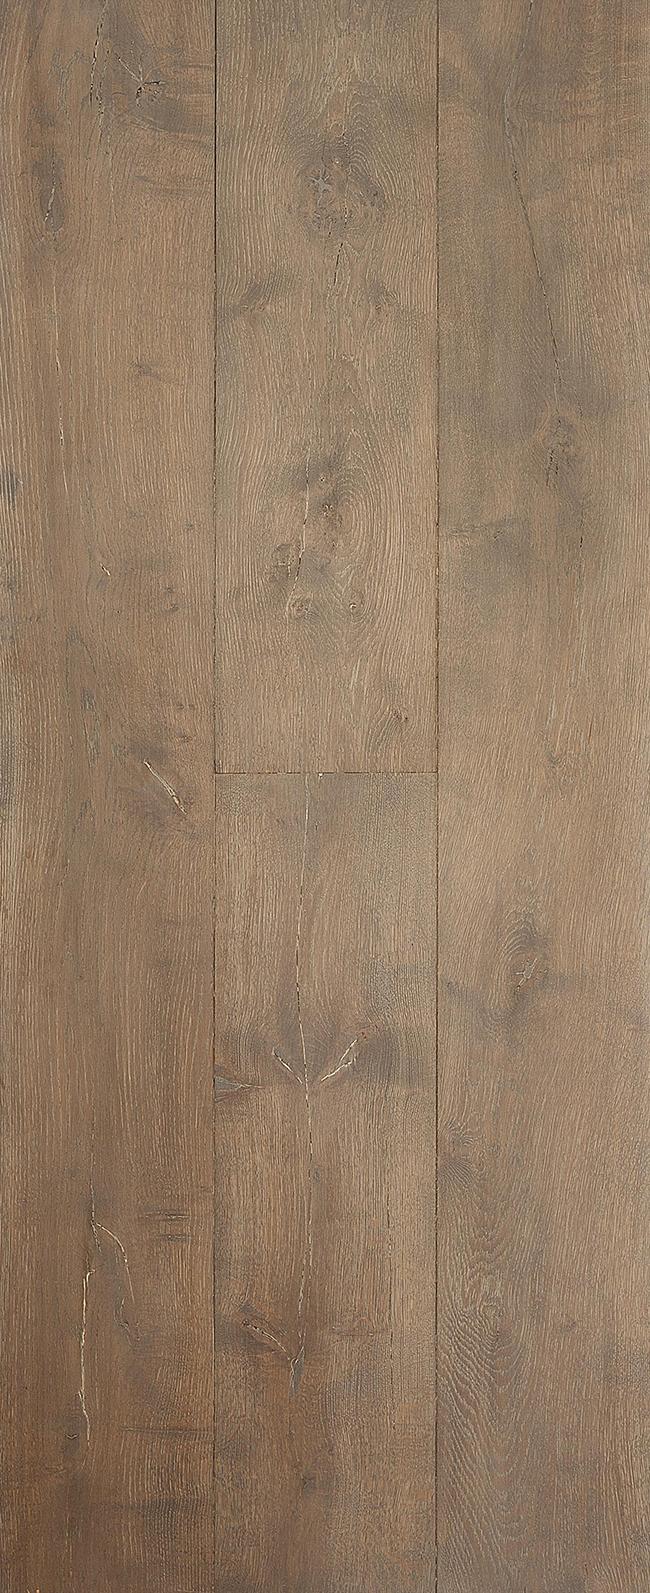 DOLPHIN Engineered Rustic Oak.jpg